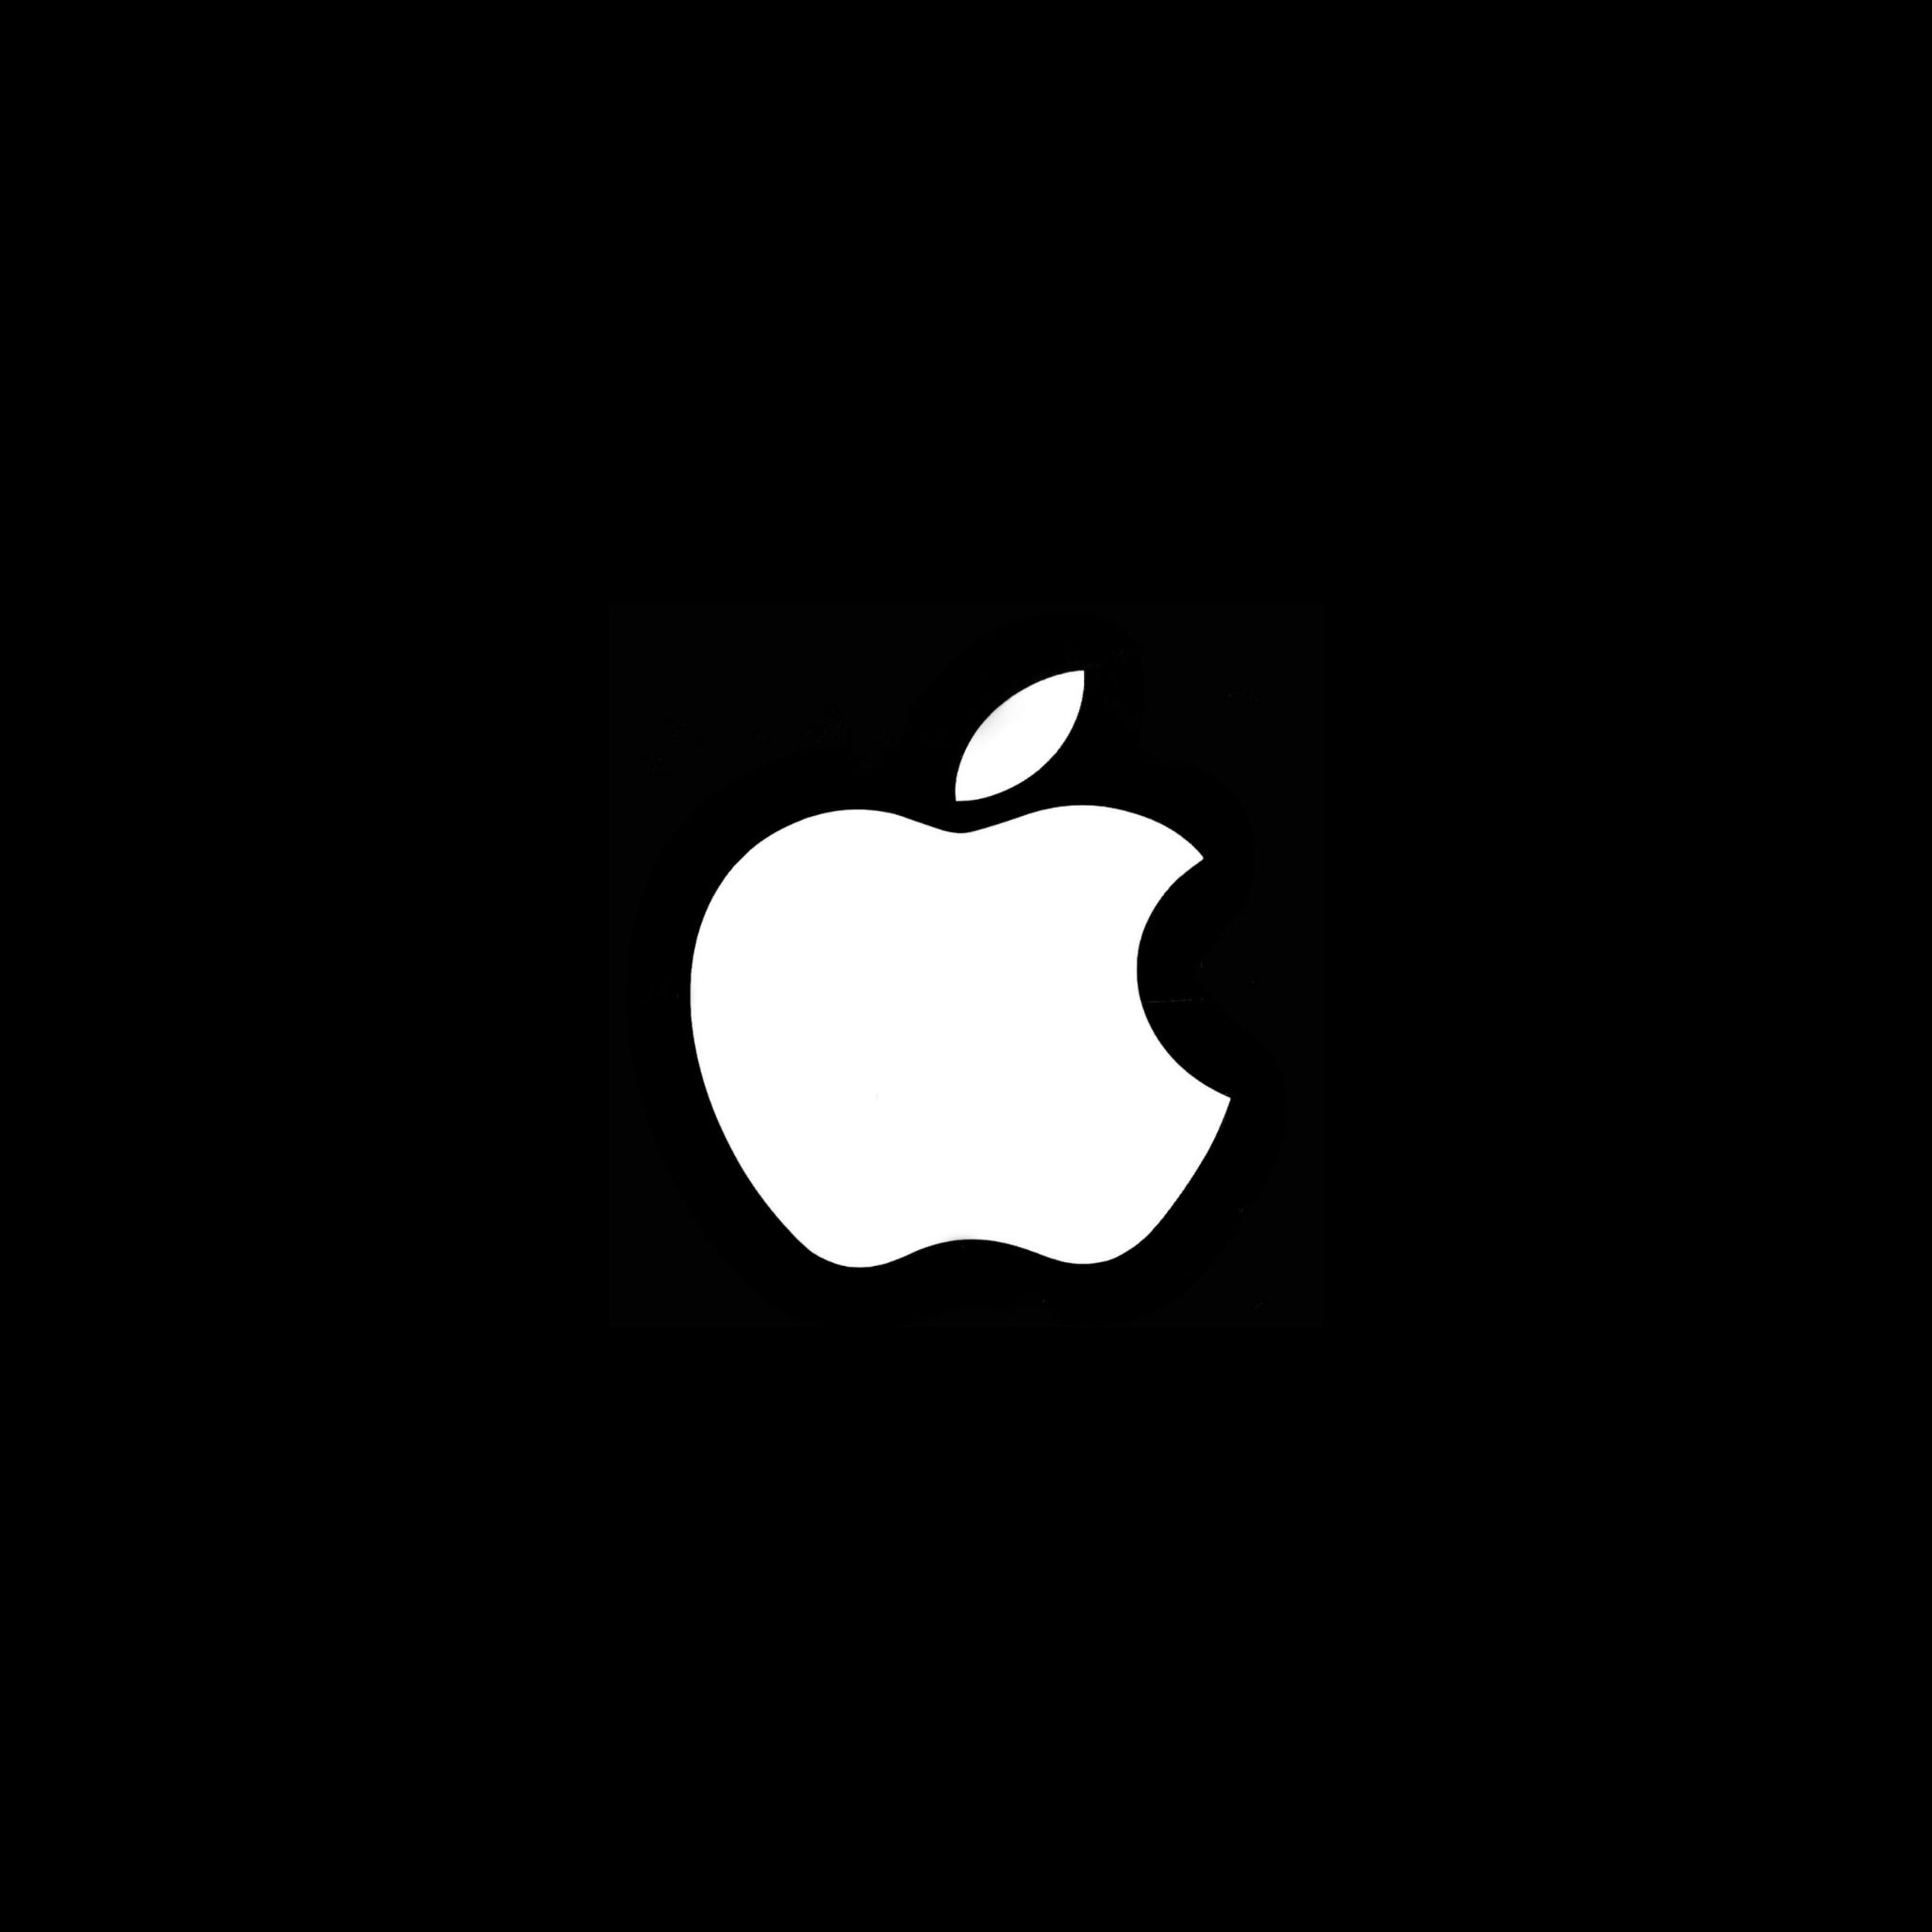 2048x2048 wallpapers iPad retina Black Background White Apple iPad Wallpaper 2048x2048 pixels resolution